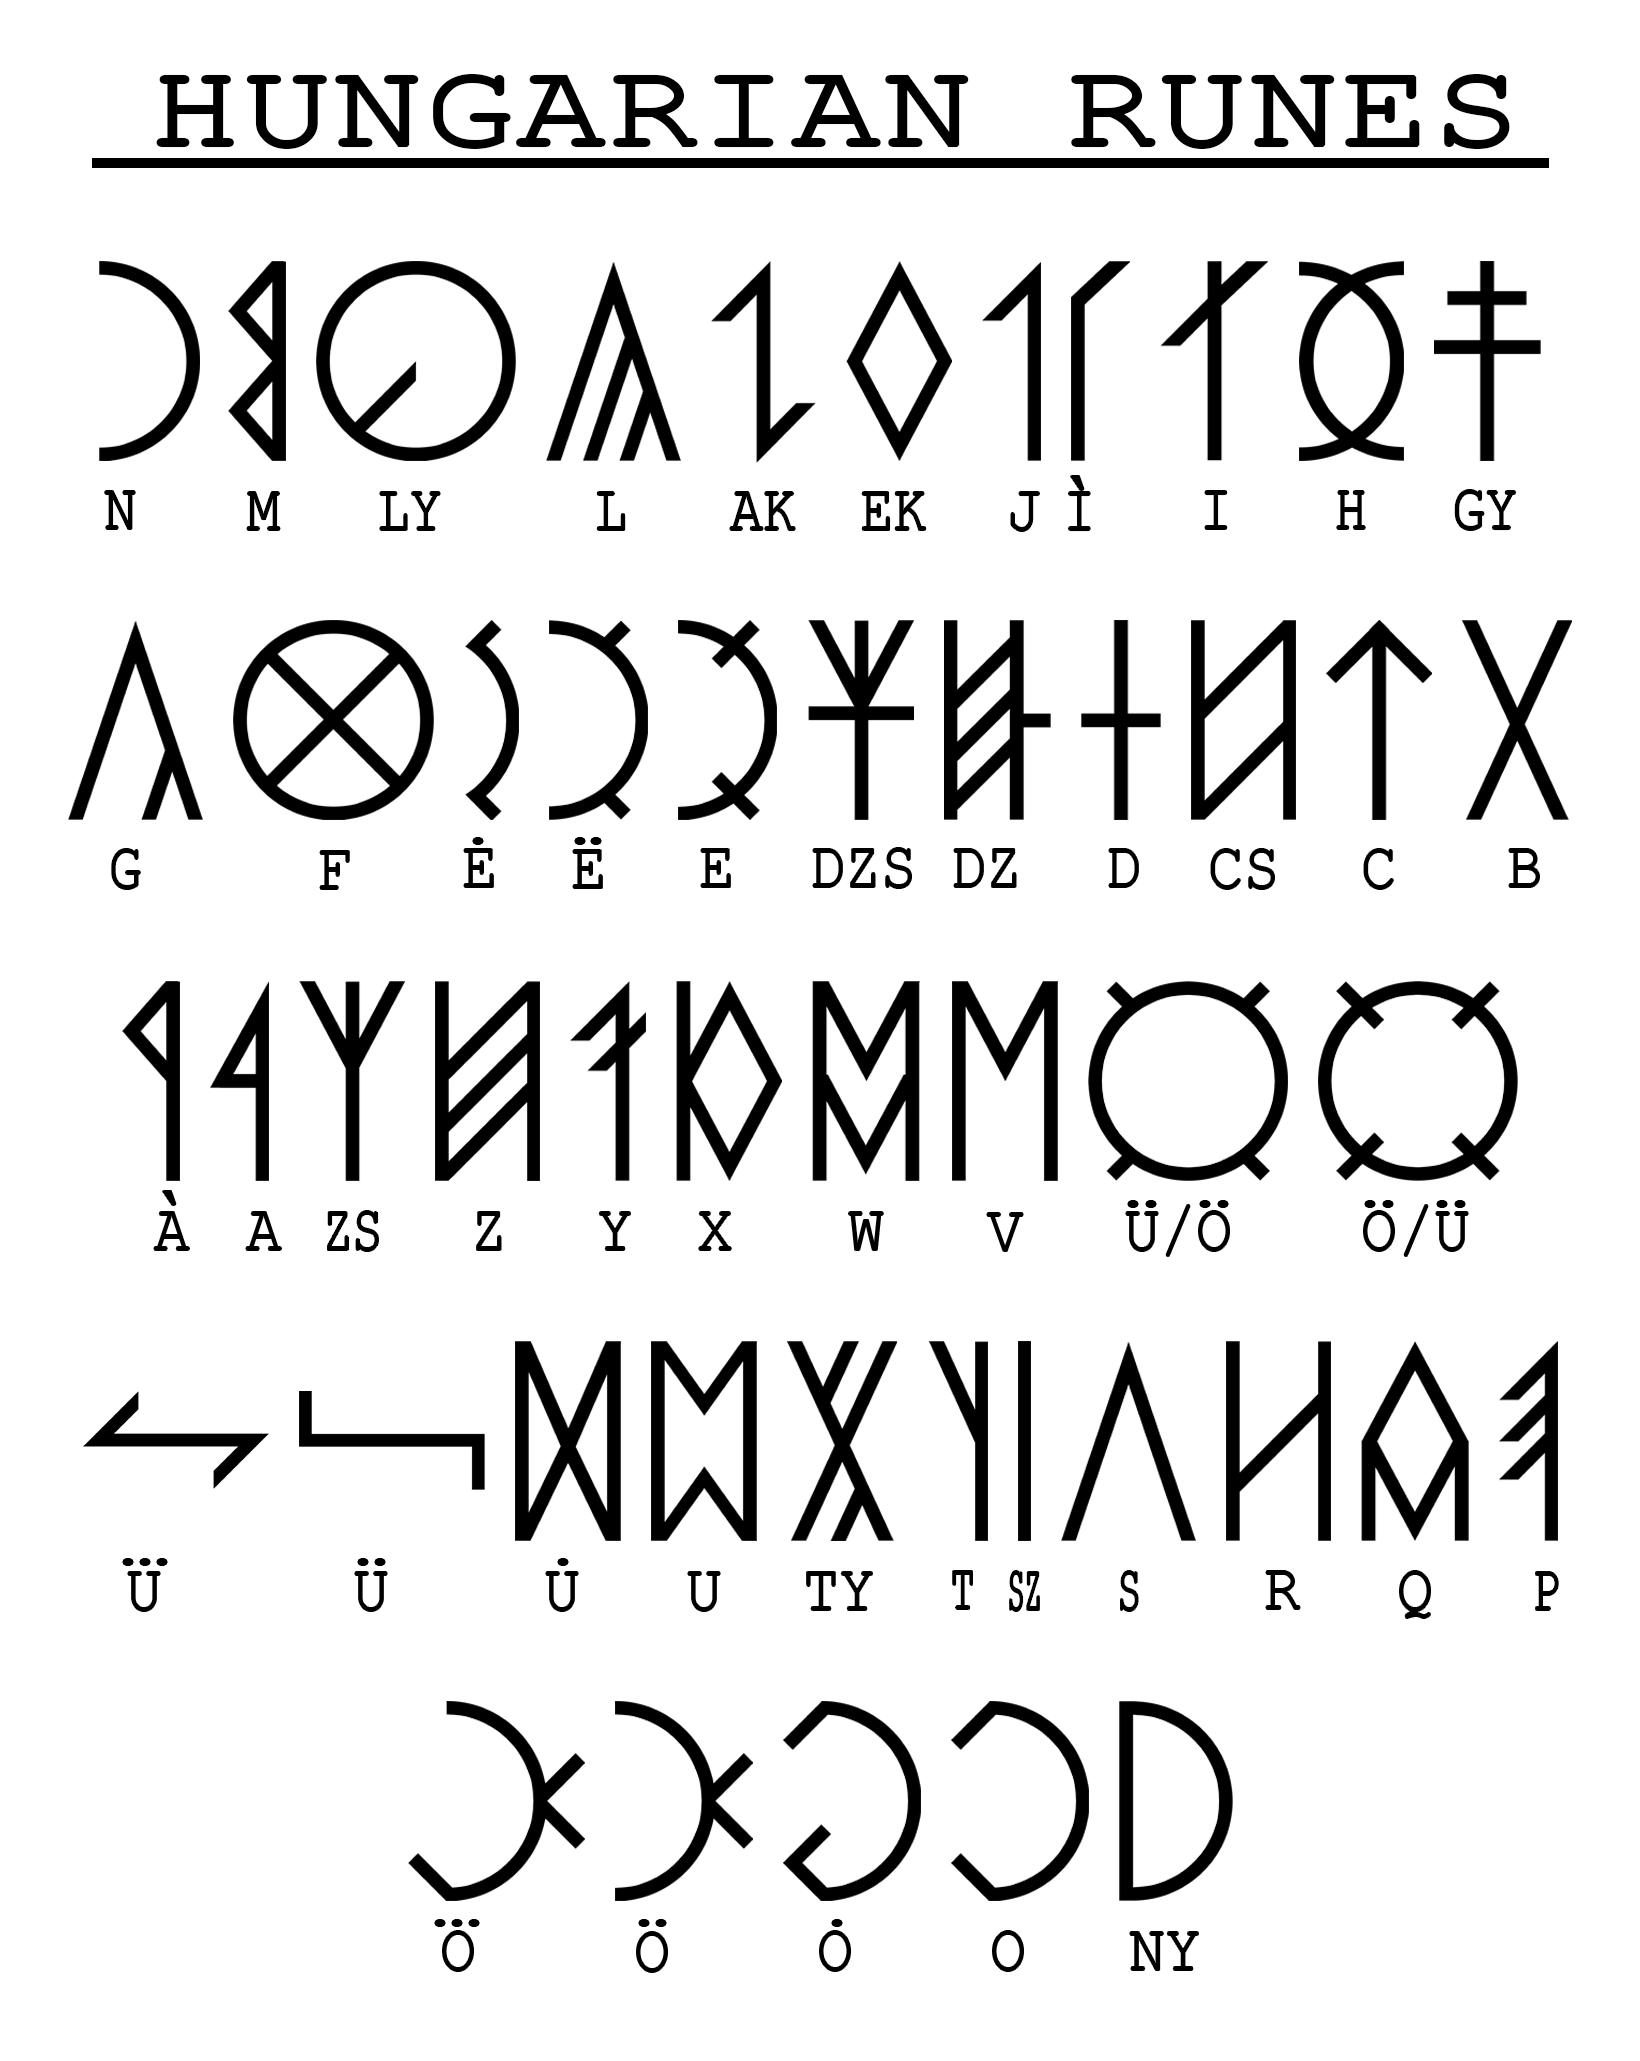 Old Hungarian Runesalphabet By Lovemystarfire On Deviantart Runes